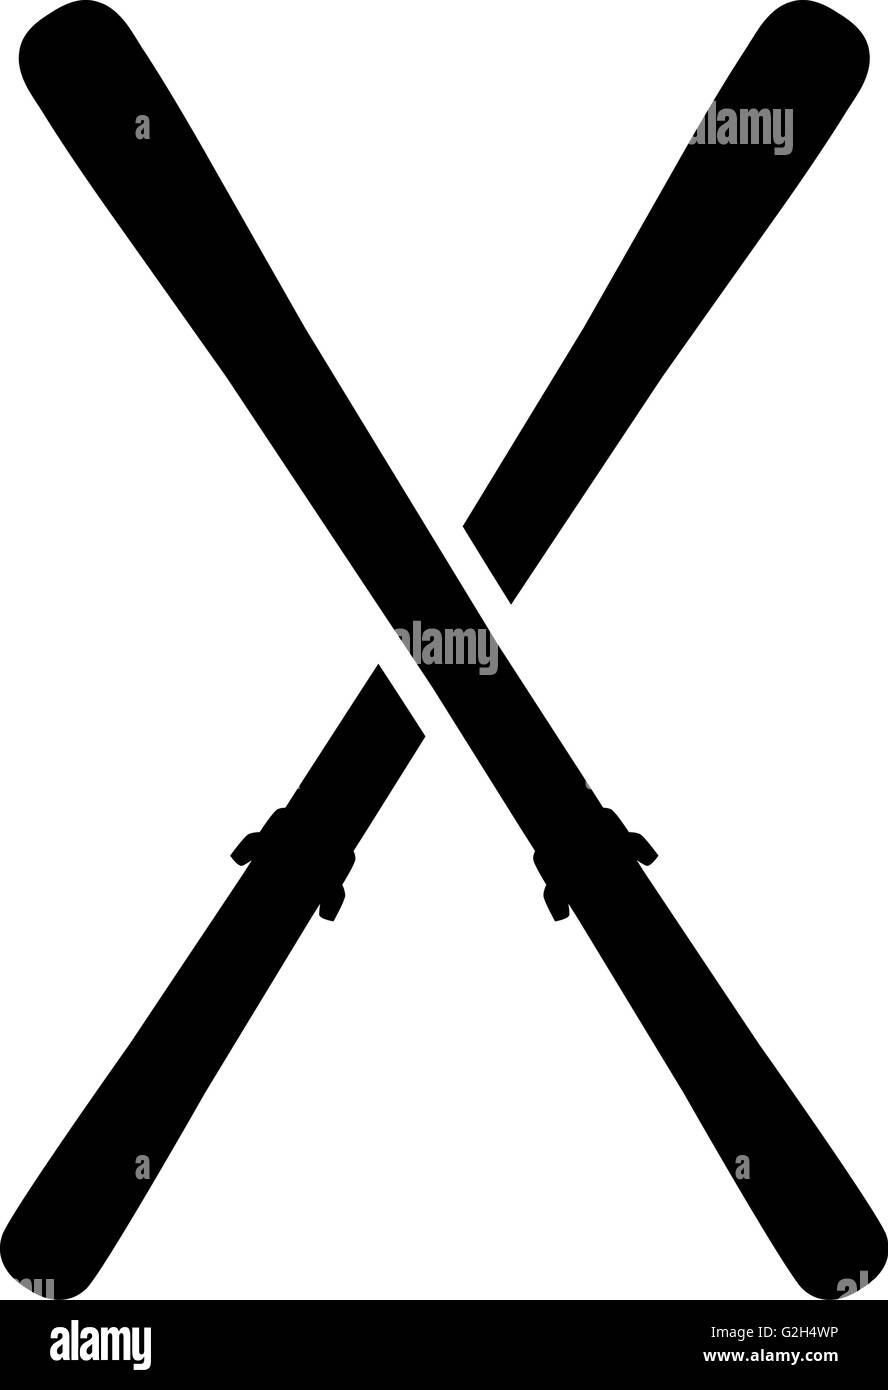 Skis Crossed Symbol - Stock Image